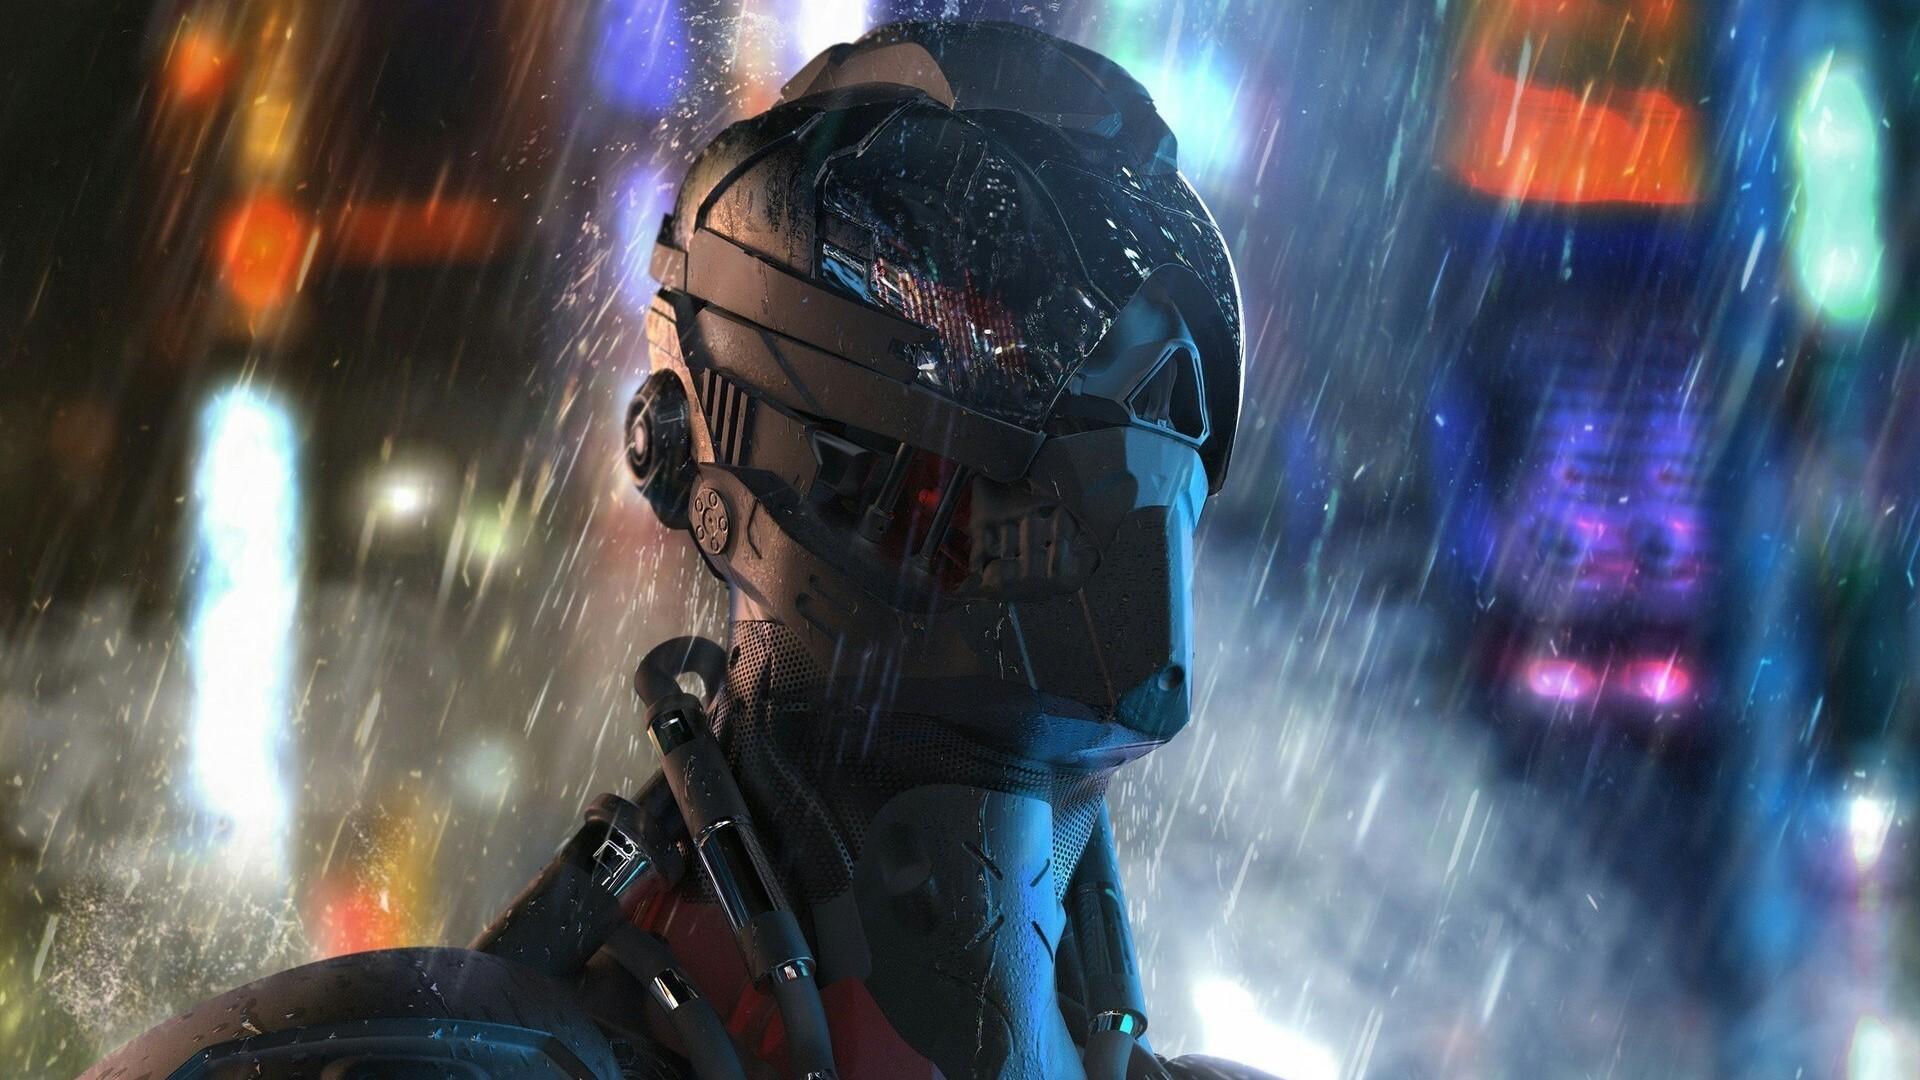 Cyborg Wallpaper Full HD